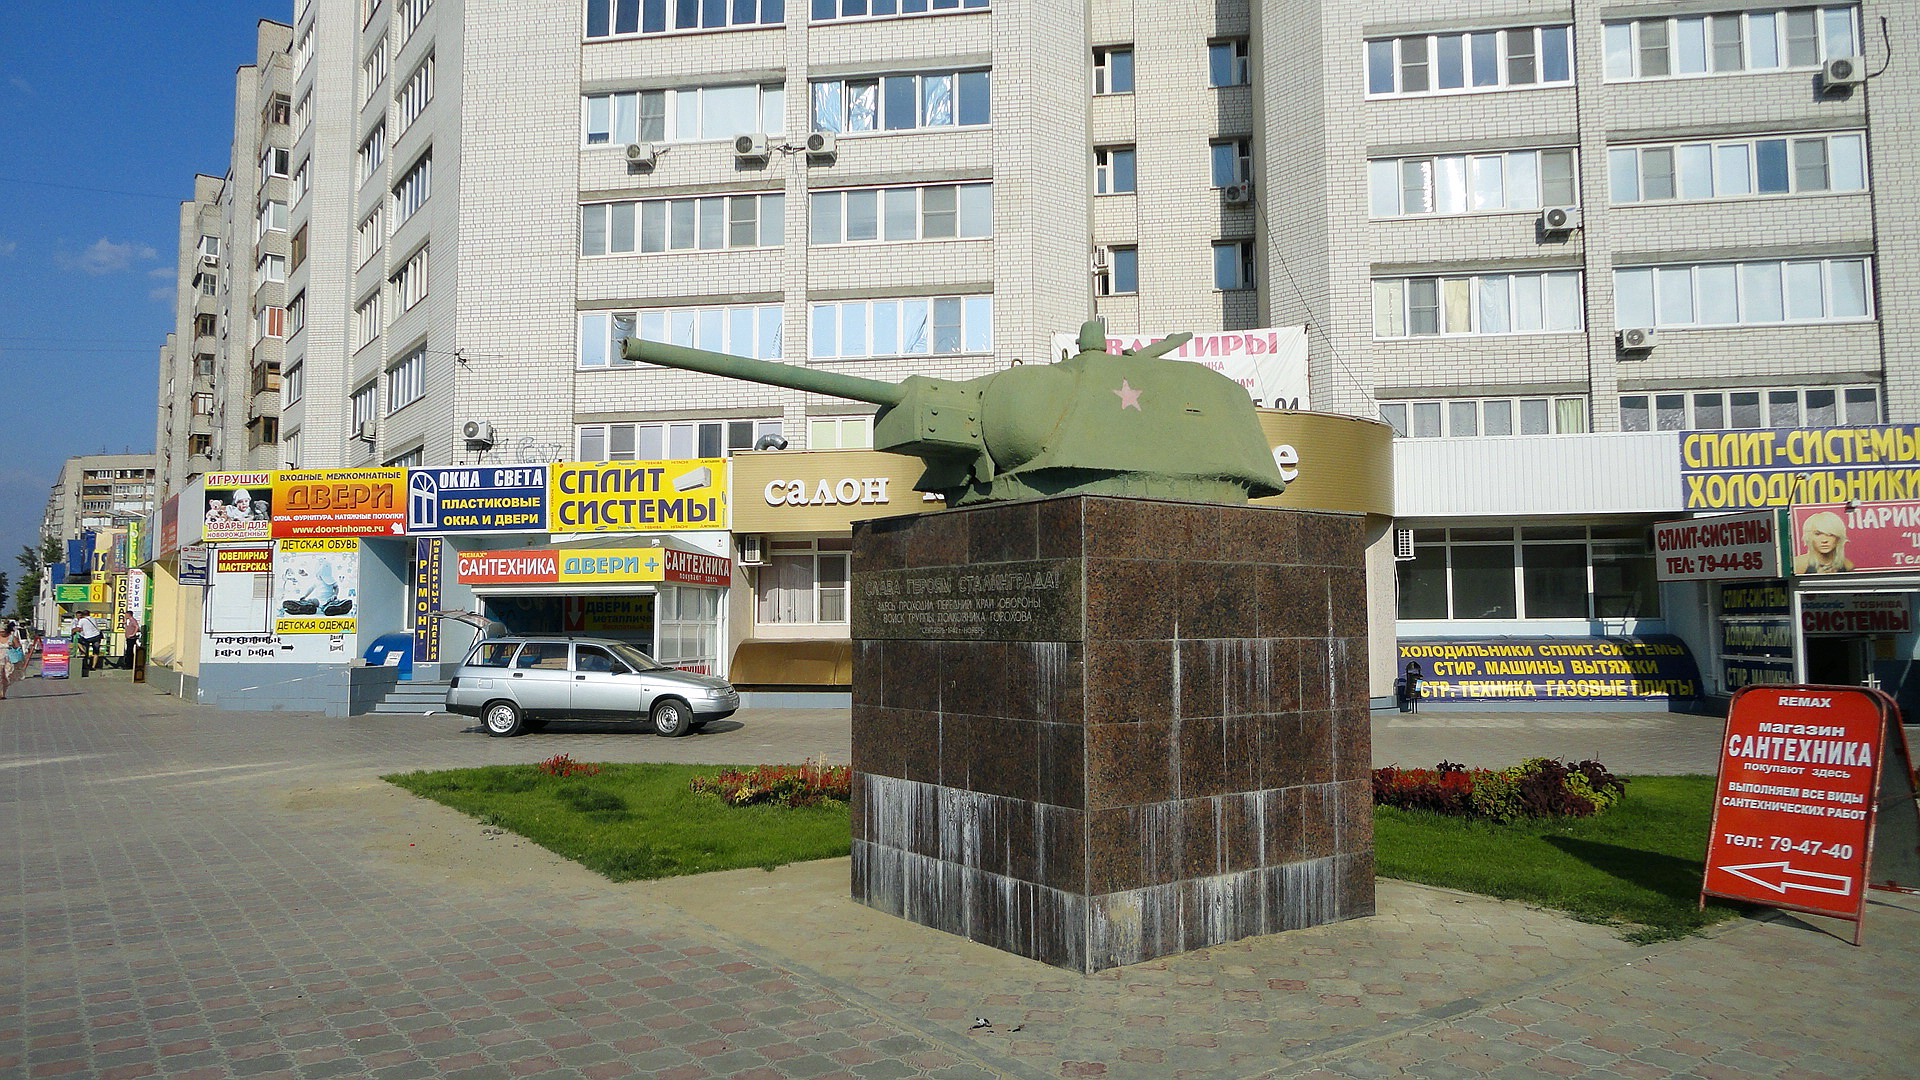 http://www.1zoom.ru/big2/416/300301-alexfas01.jpg